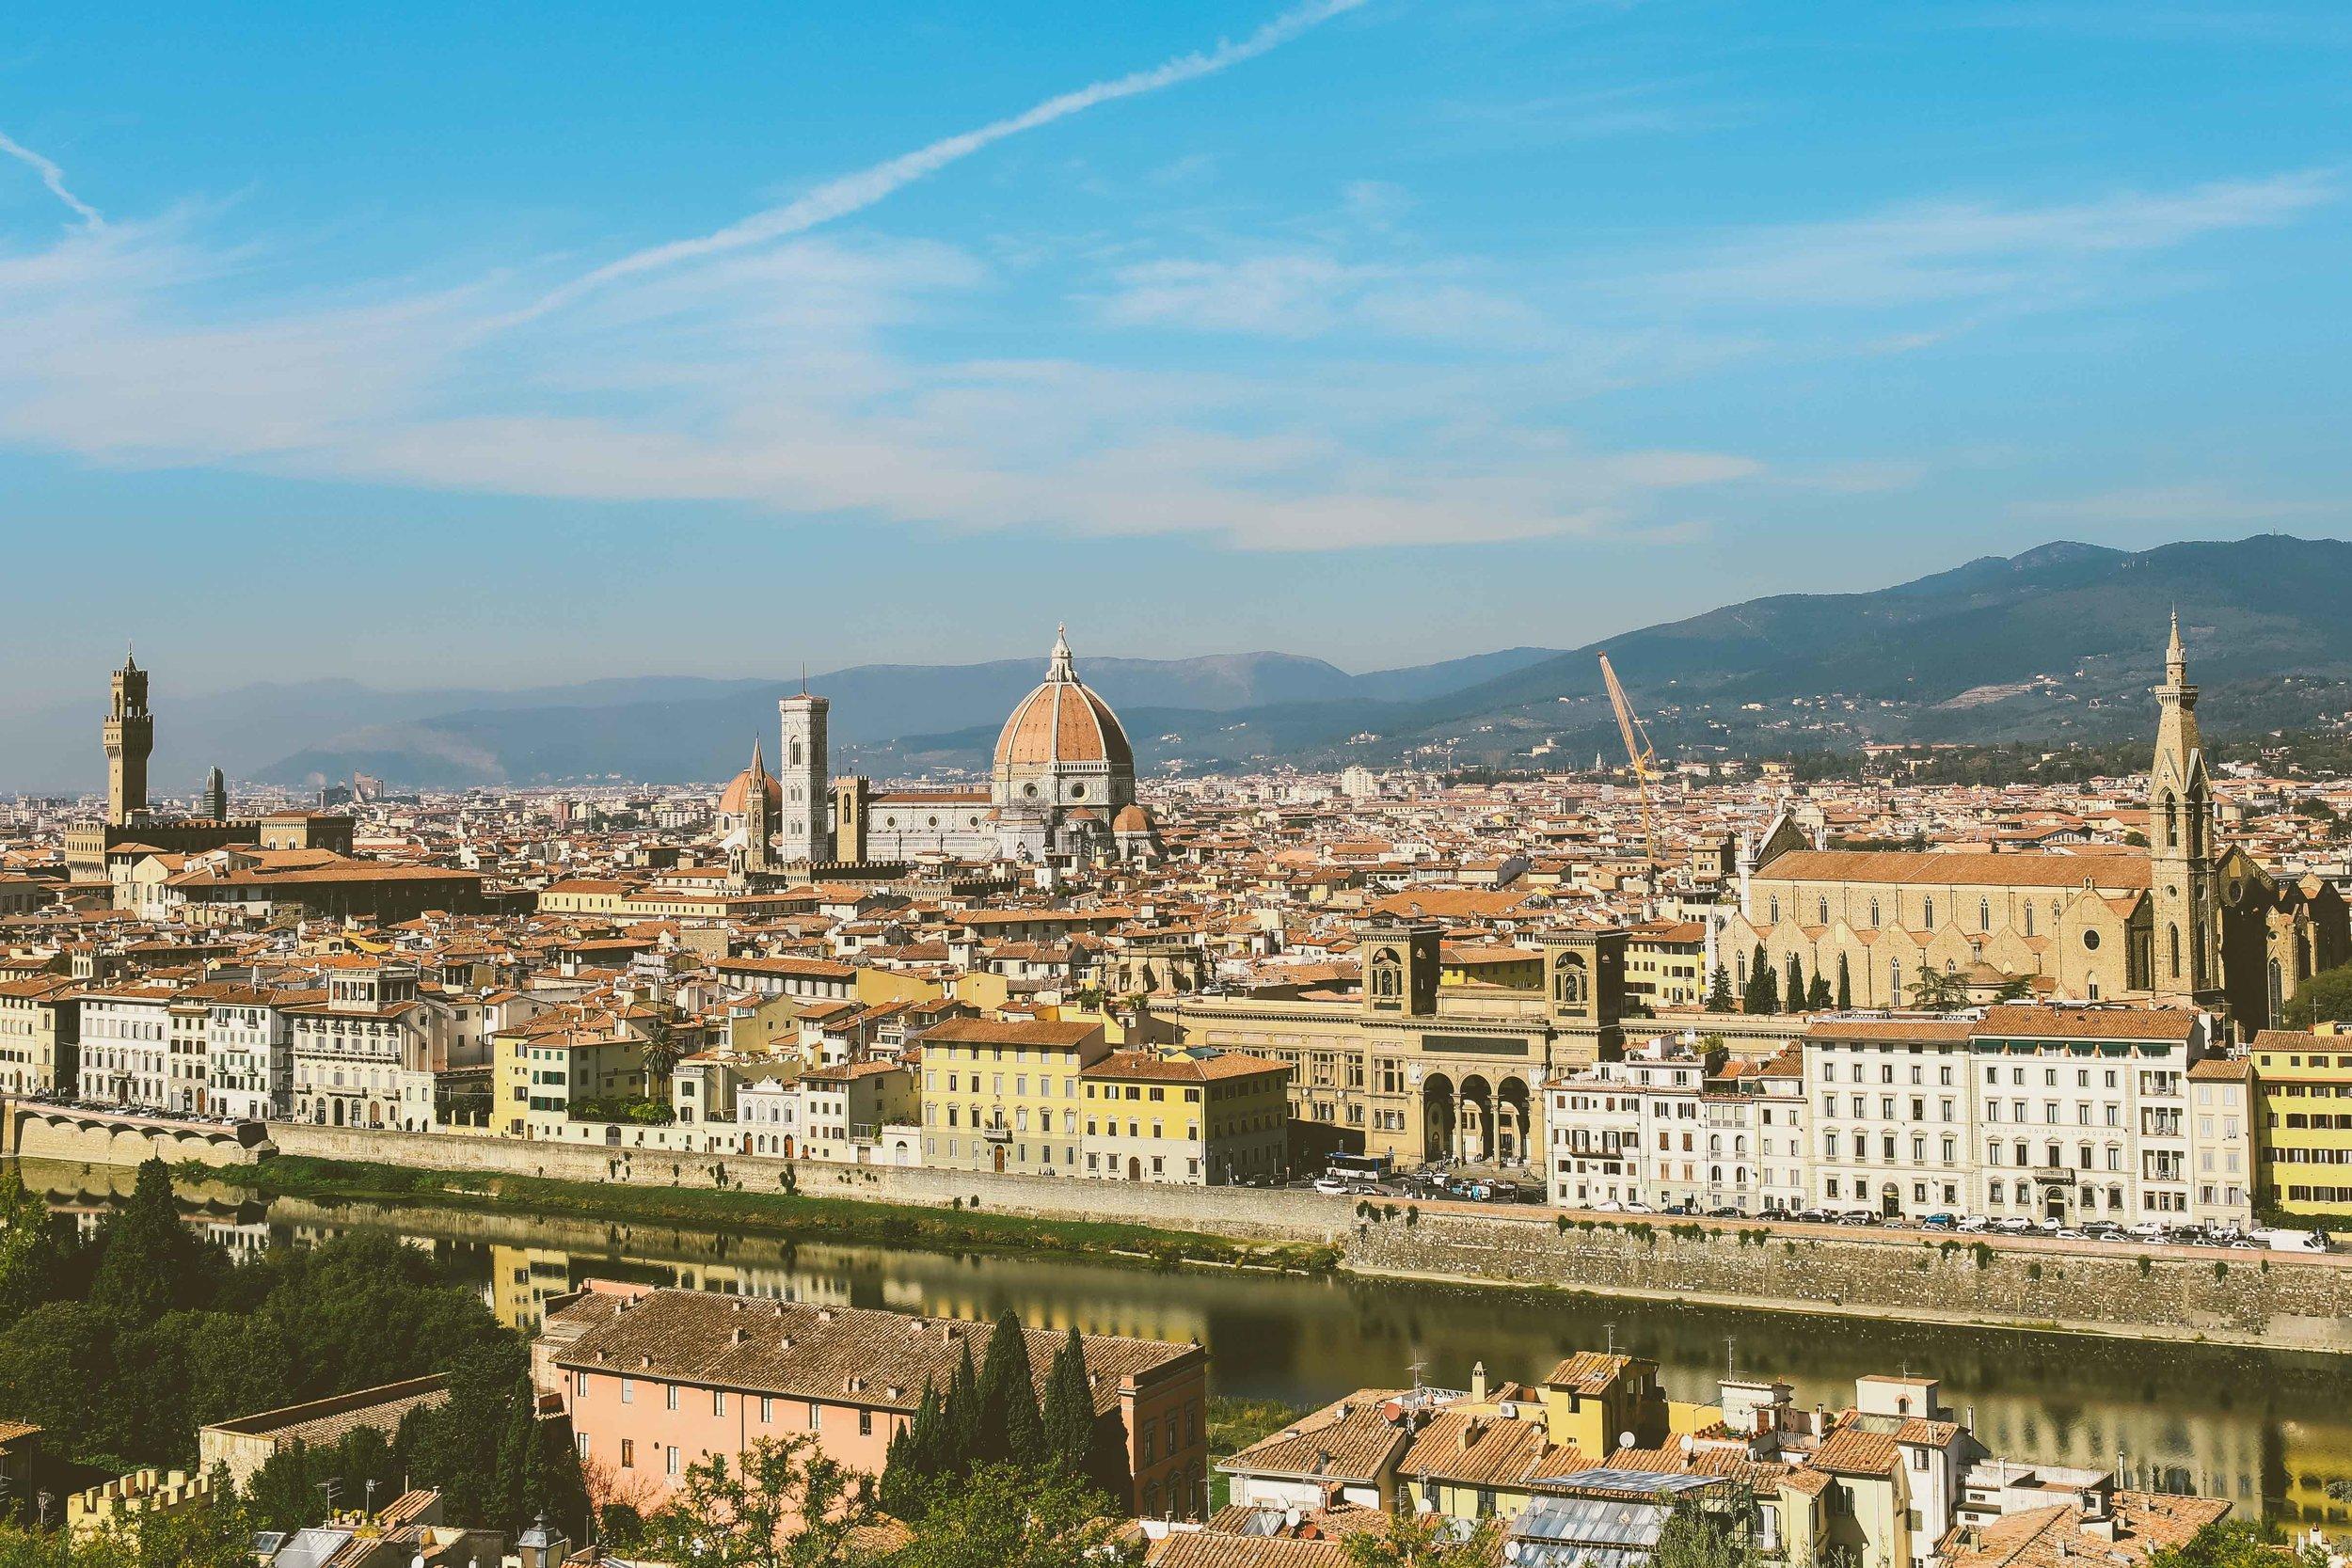 Street_Photographer_Florence_Italy_9.jpg